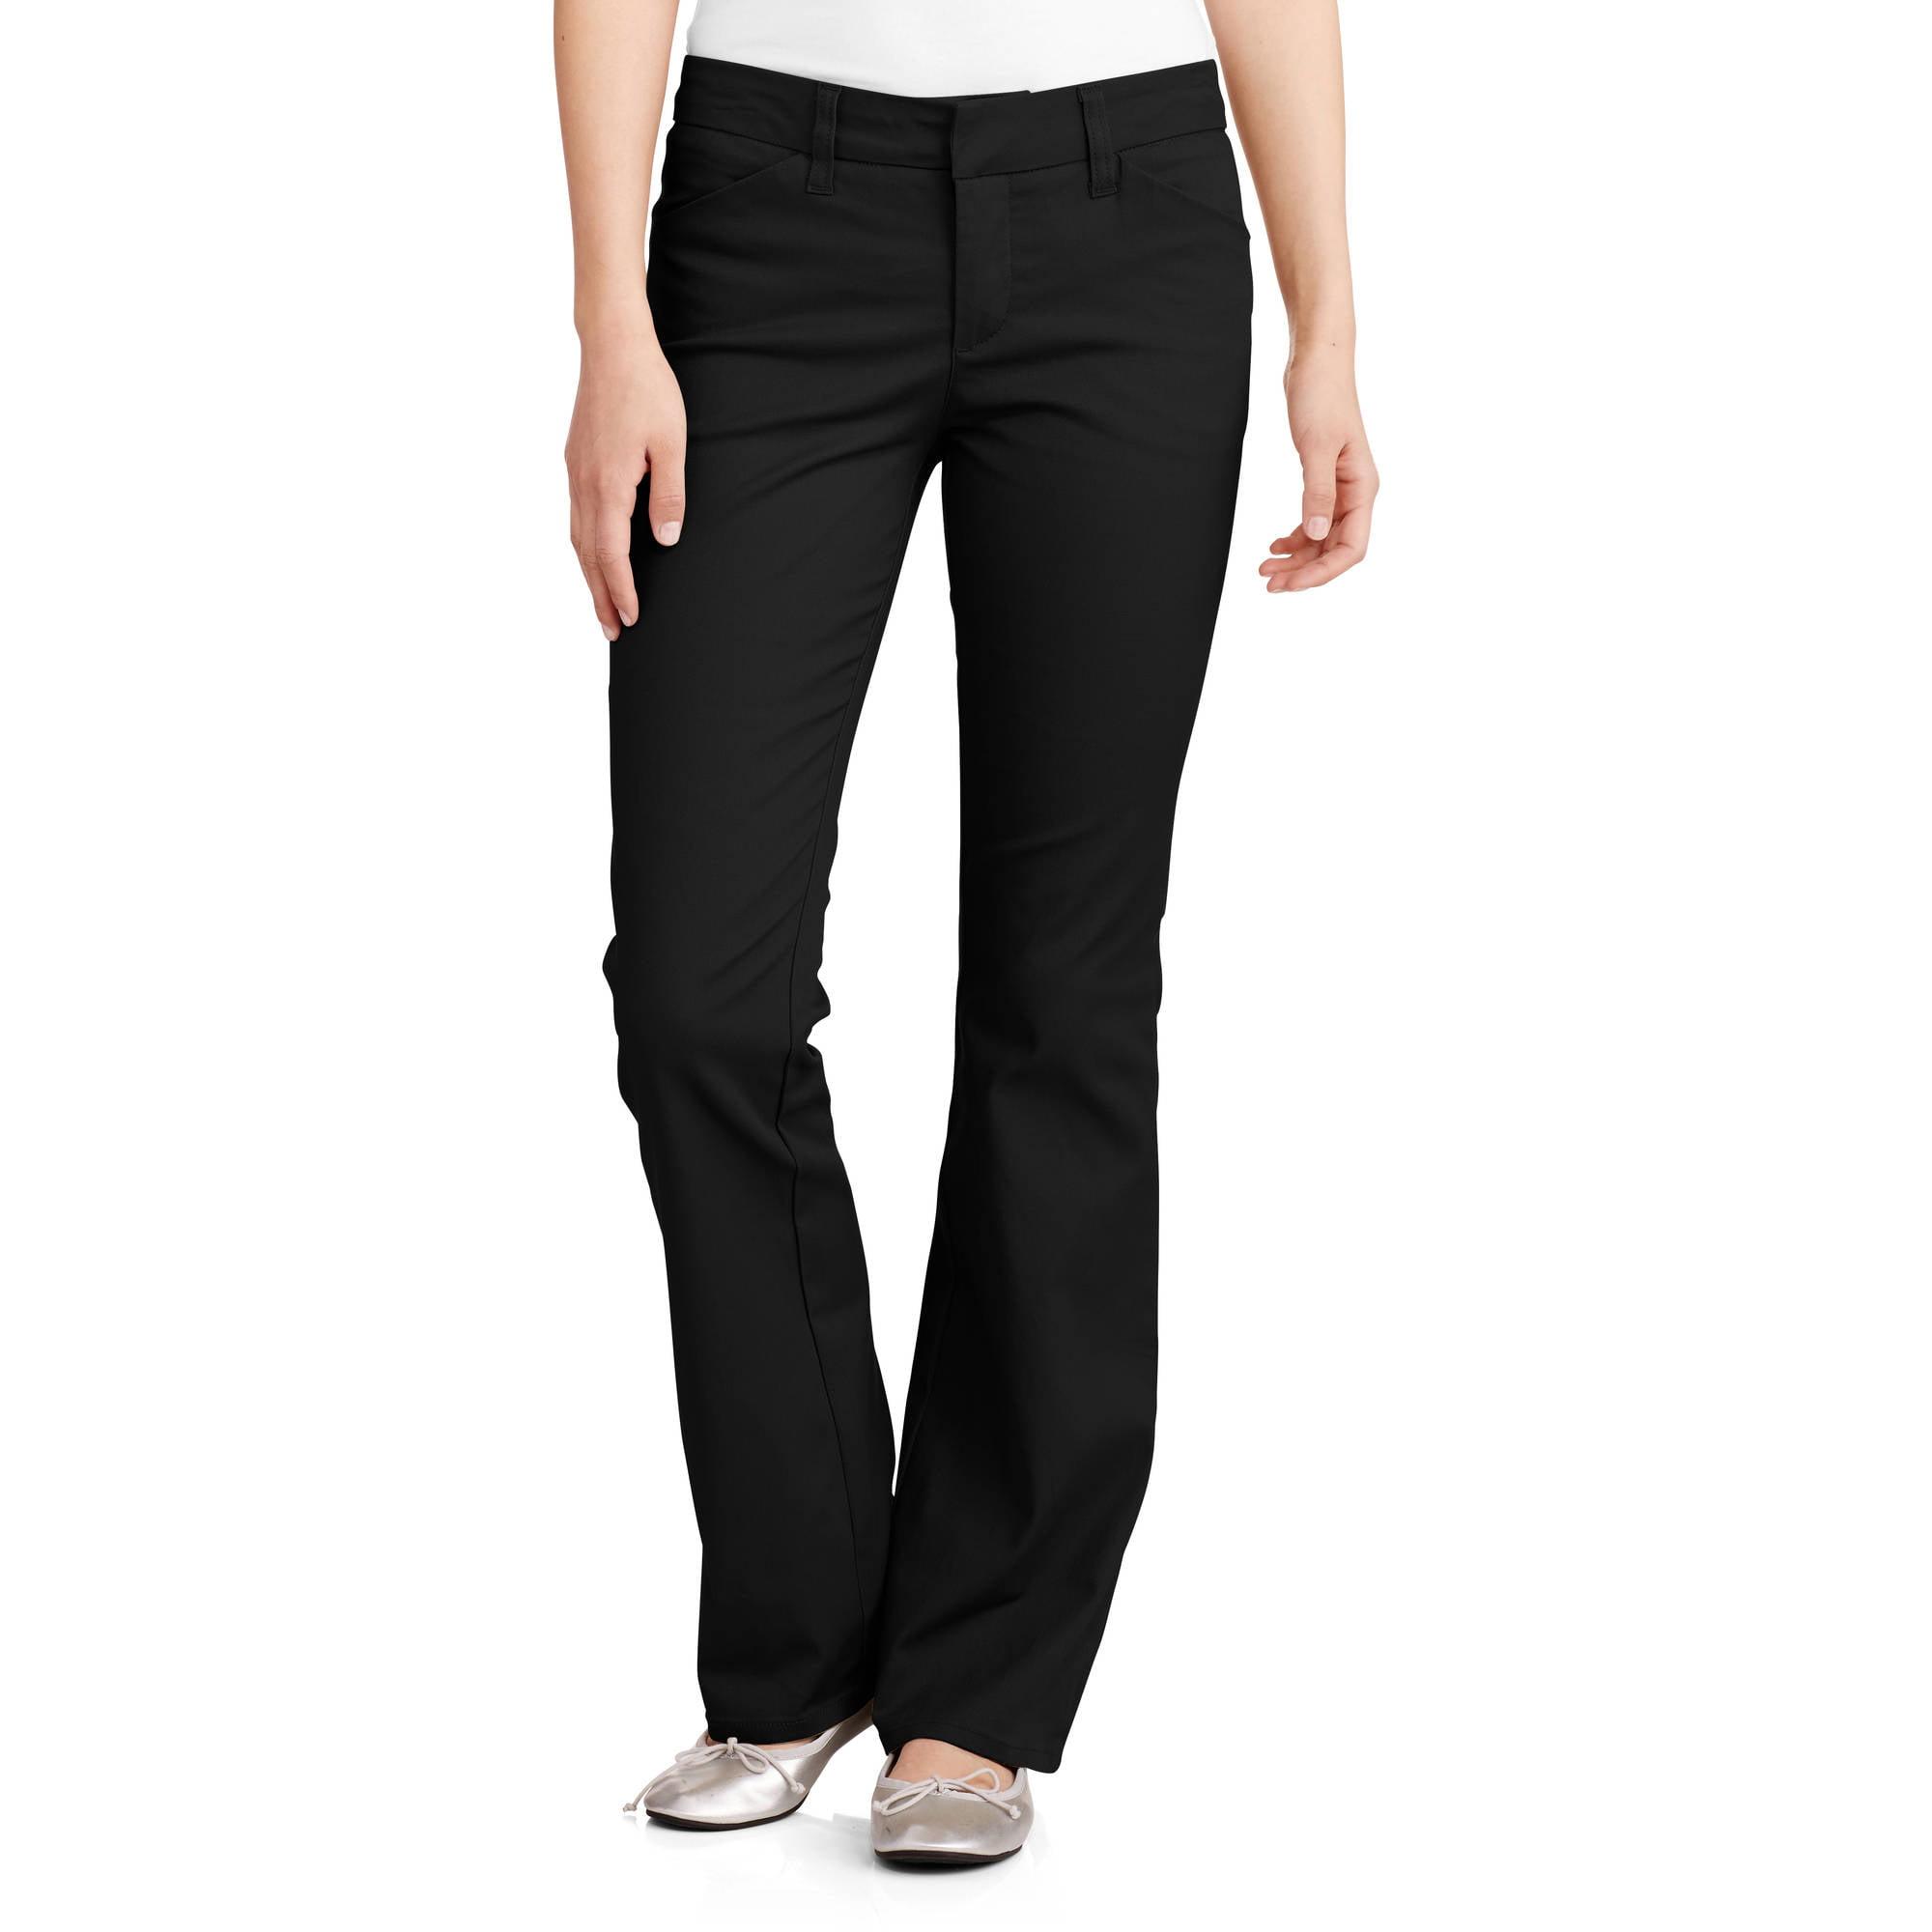 Dickies Juniors School Uniform 4 Pocket Slim Bootcut Pant